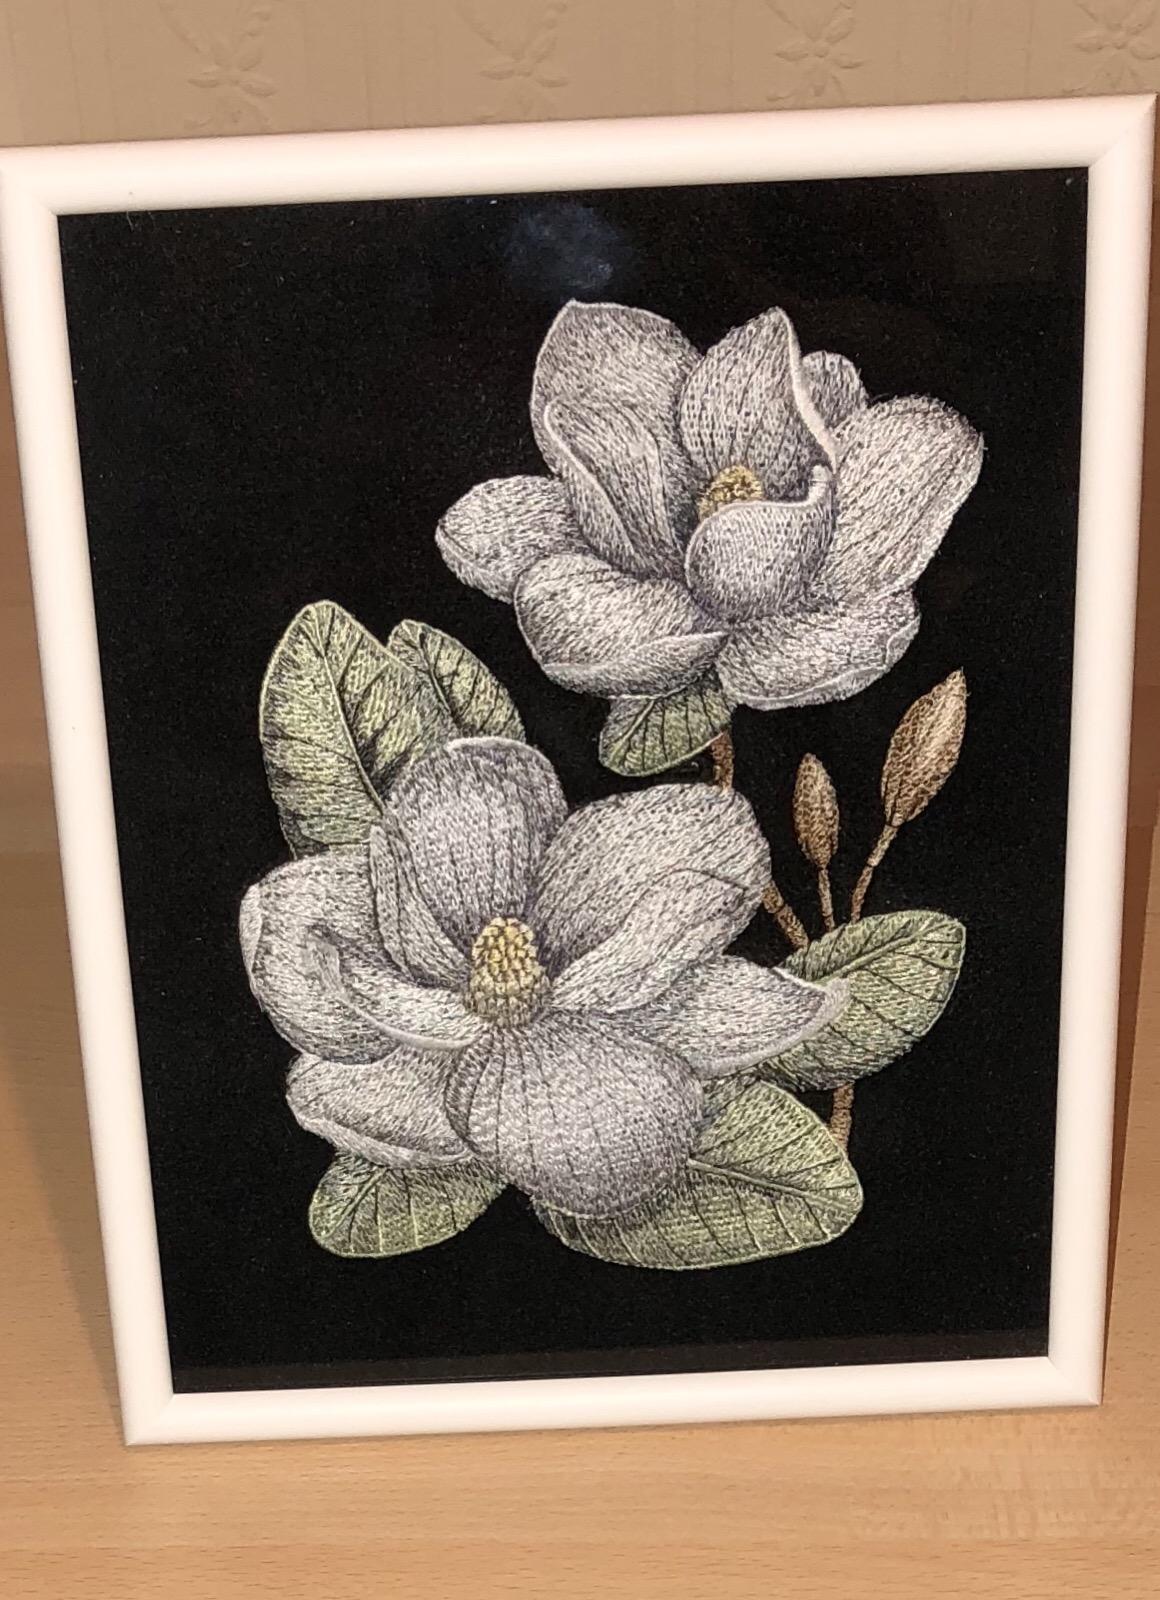 Embroidery/IMG_2187.JPG